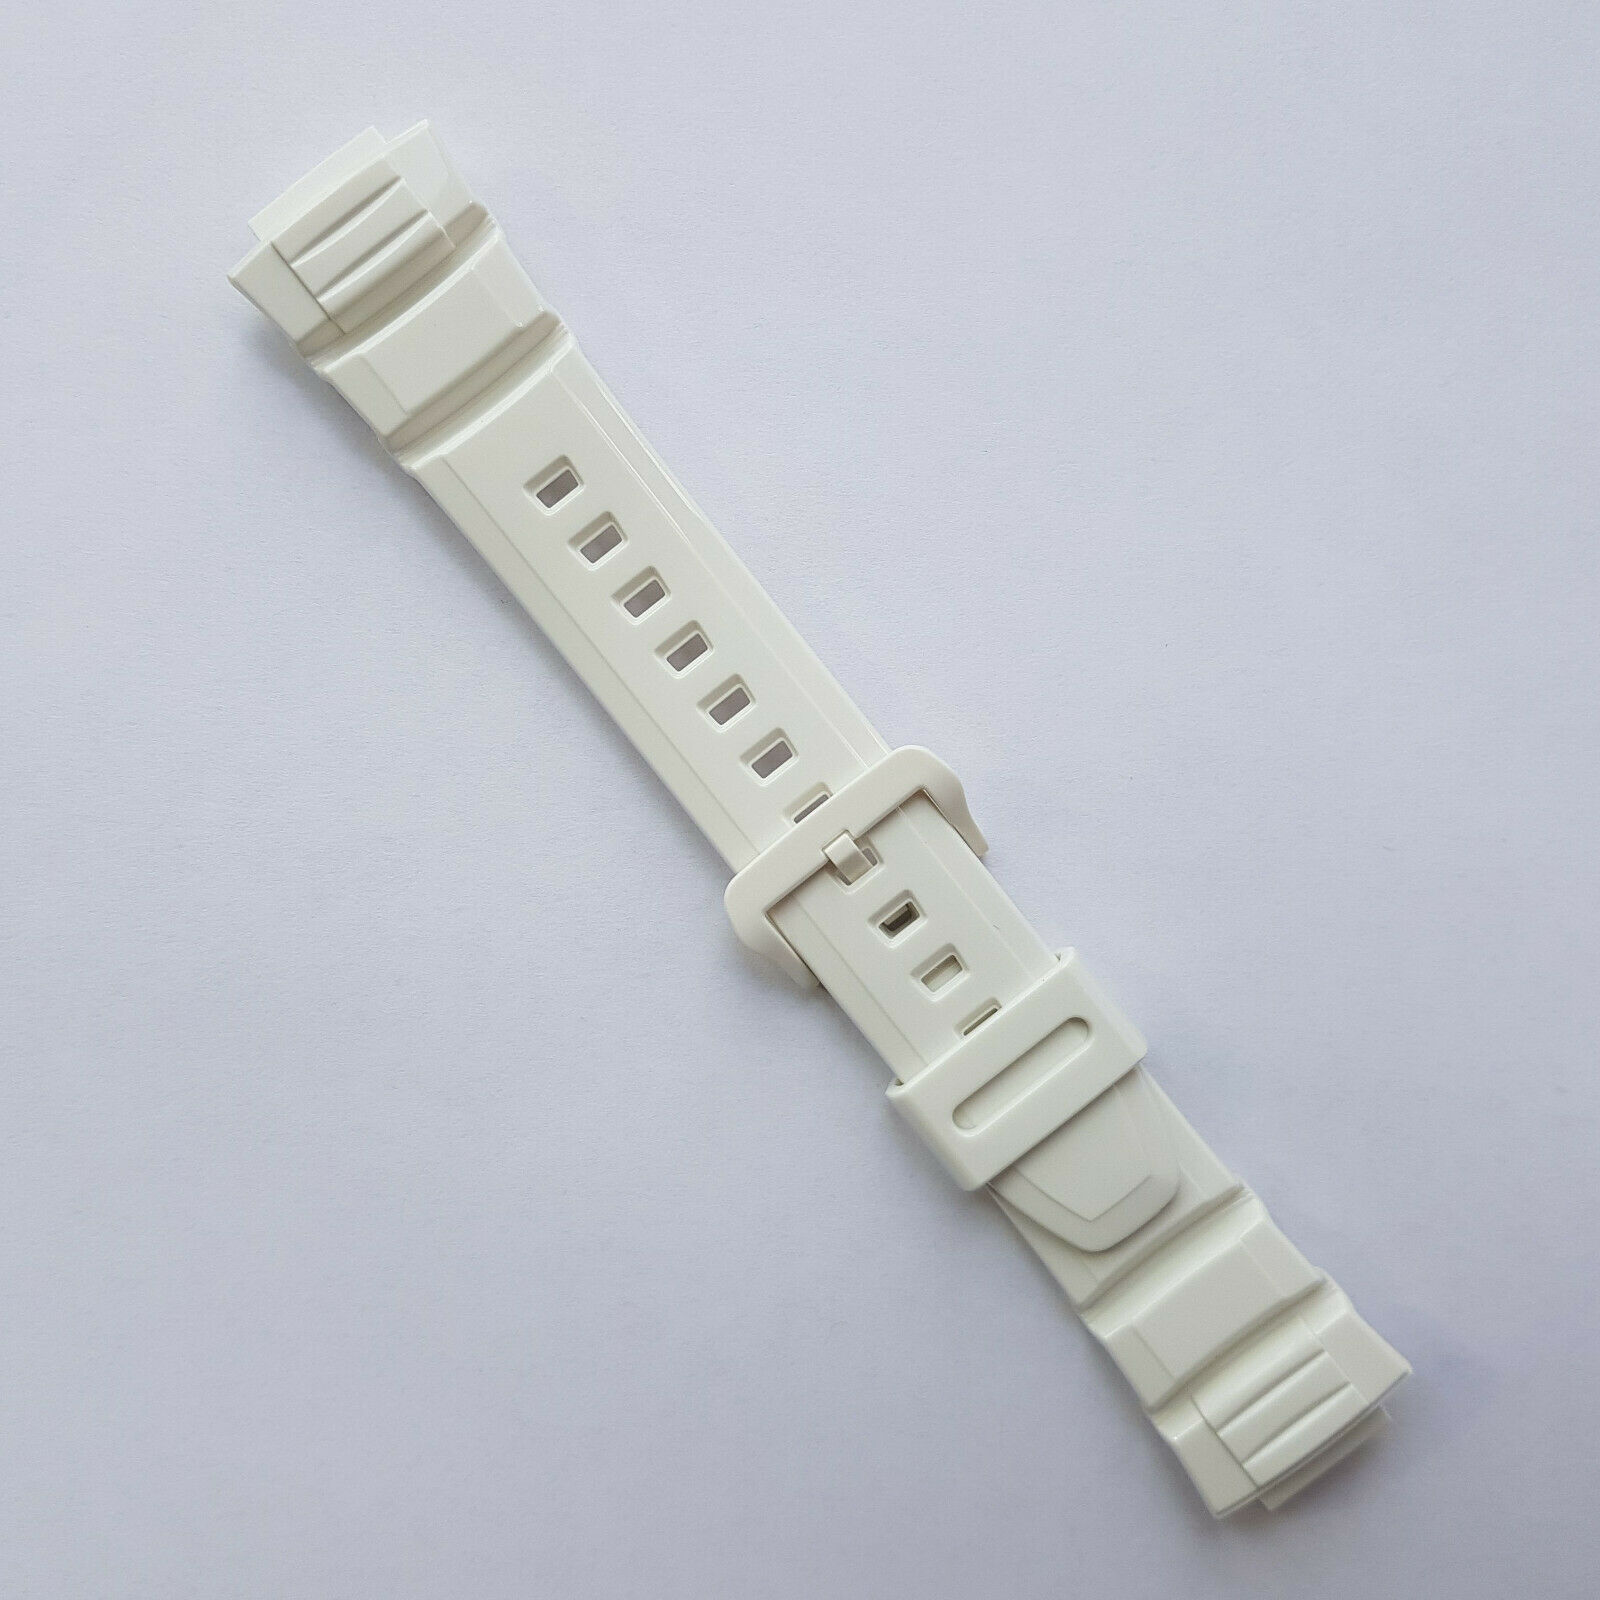 Pulseira Casio W-S220C-7Bv Resina Branca Verniz  - E-Presentes